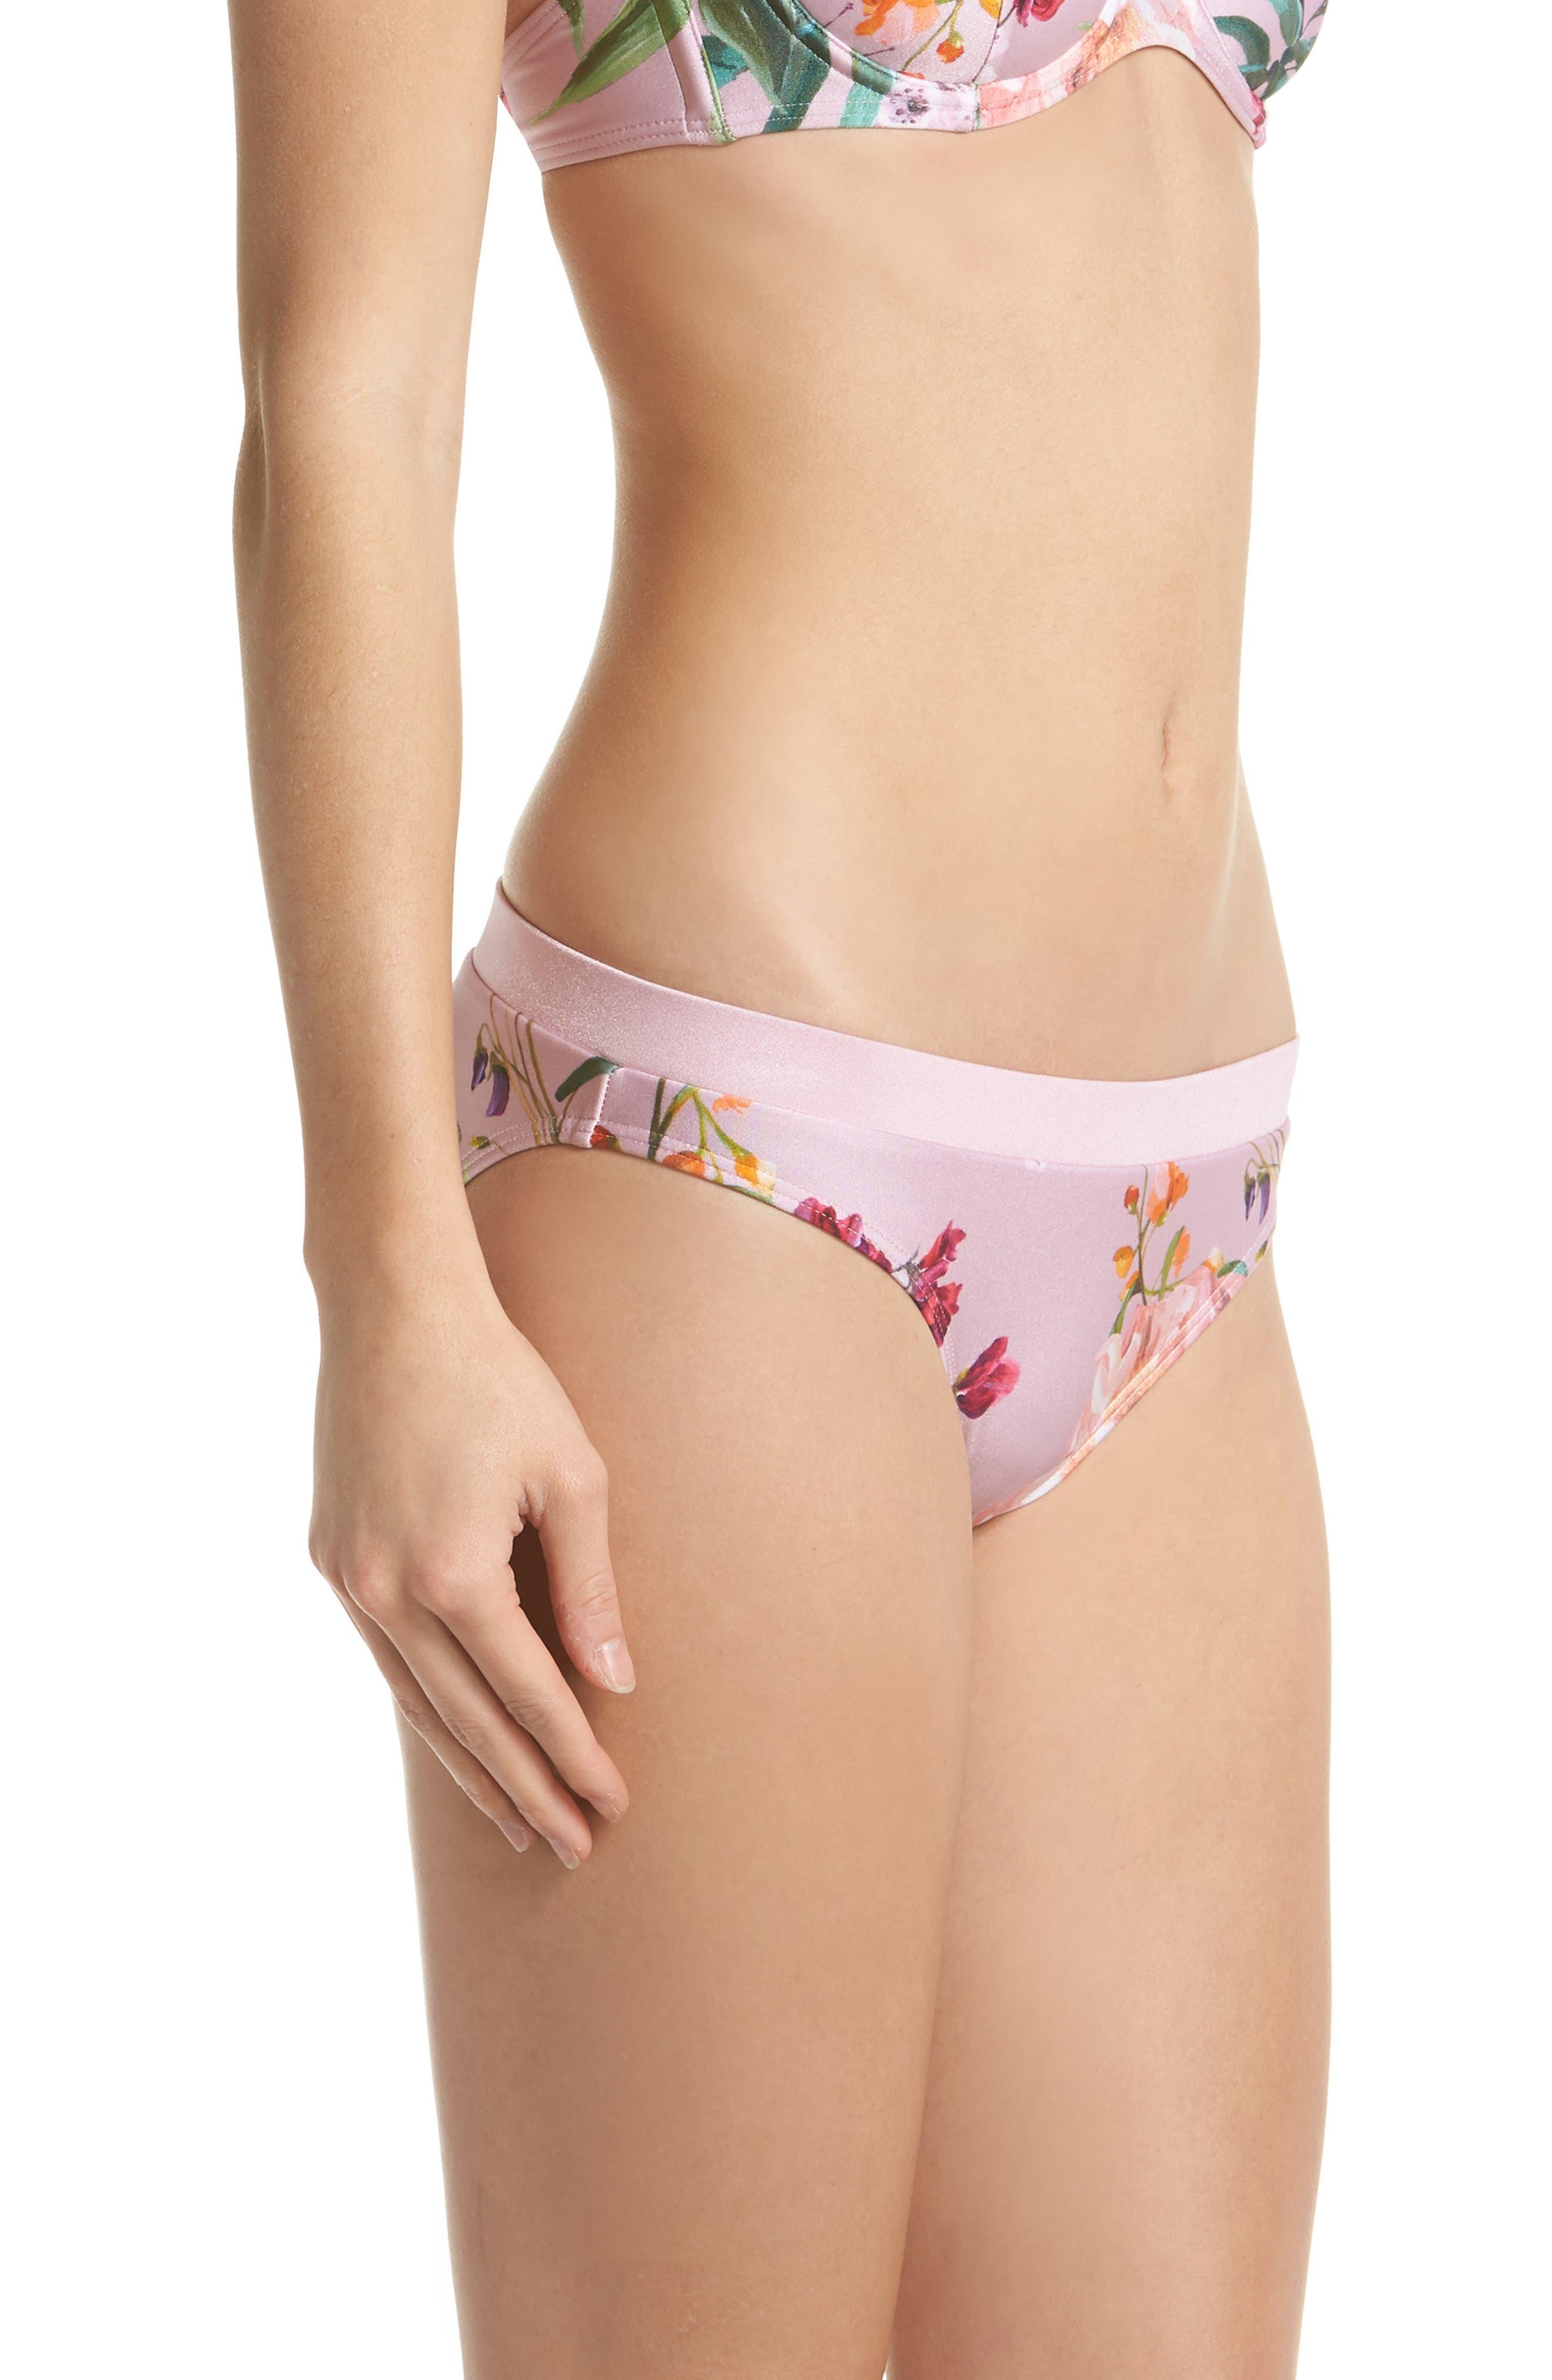 Serenity Floral Bikini Bottoms,                             Alternate thumbnail 3, color,                             PALE PINK